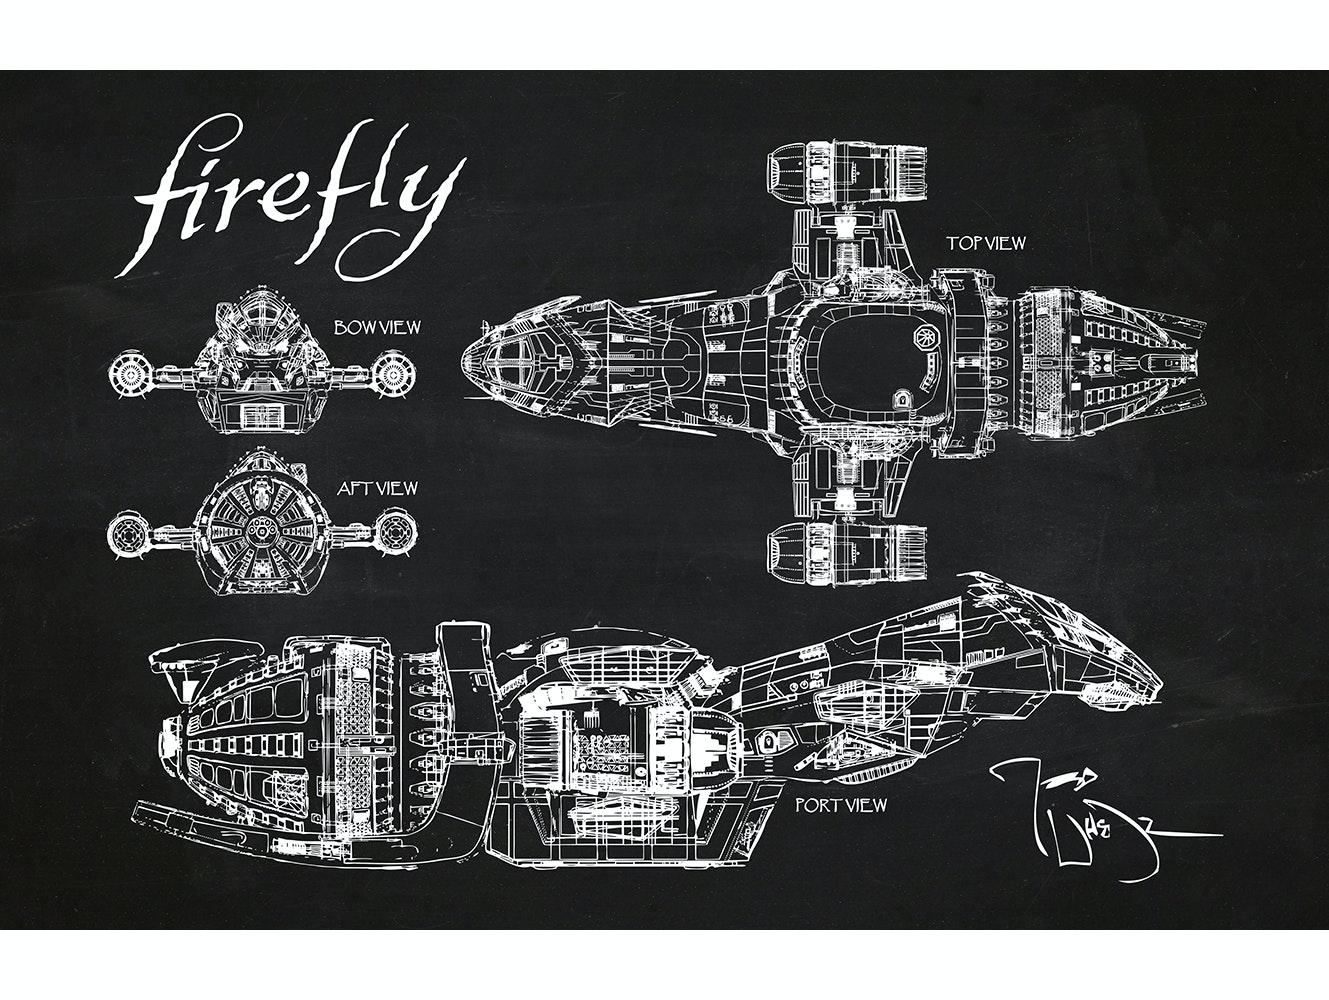 Firefly - Serenity (Horizontal Print)